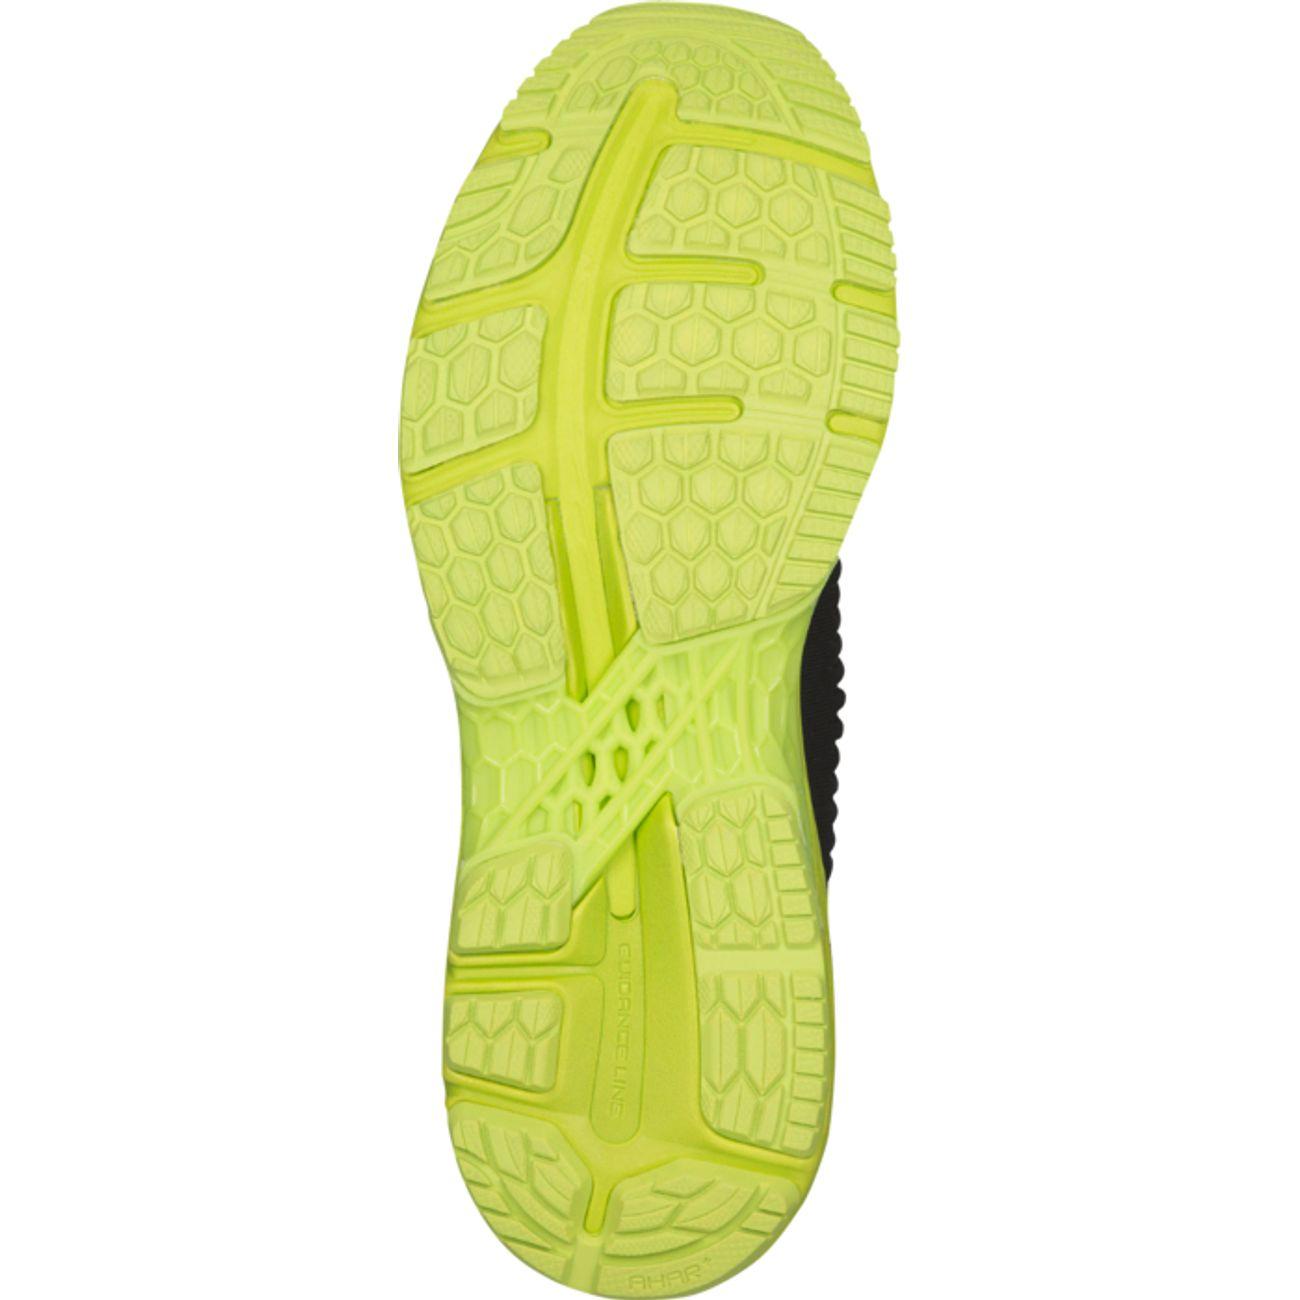 Basses Asics Chaussures Running Homme Kayano Gel 25 rCedoWxB